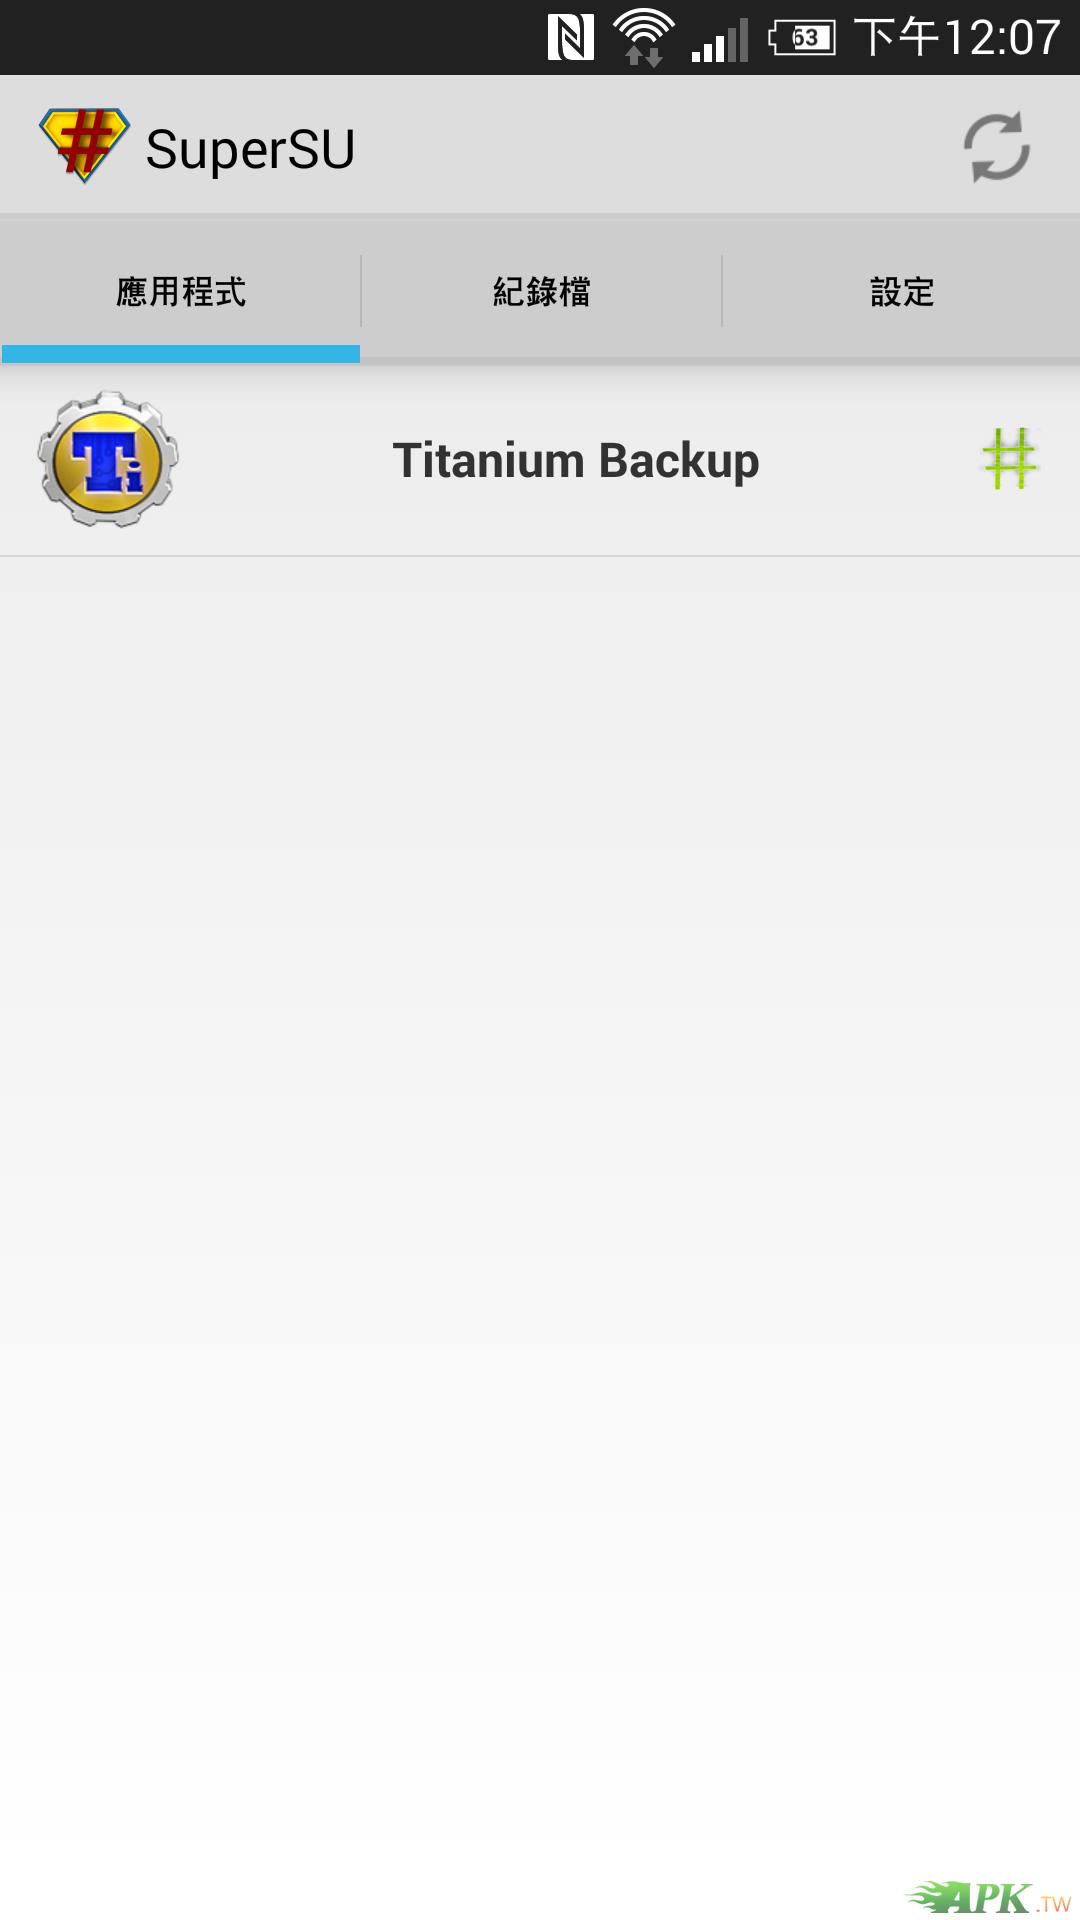 Screenshot (12_07下午, 3月 29, 2014).jpg